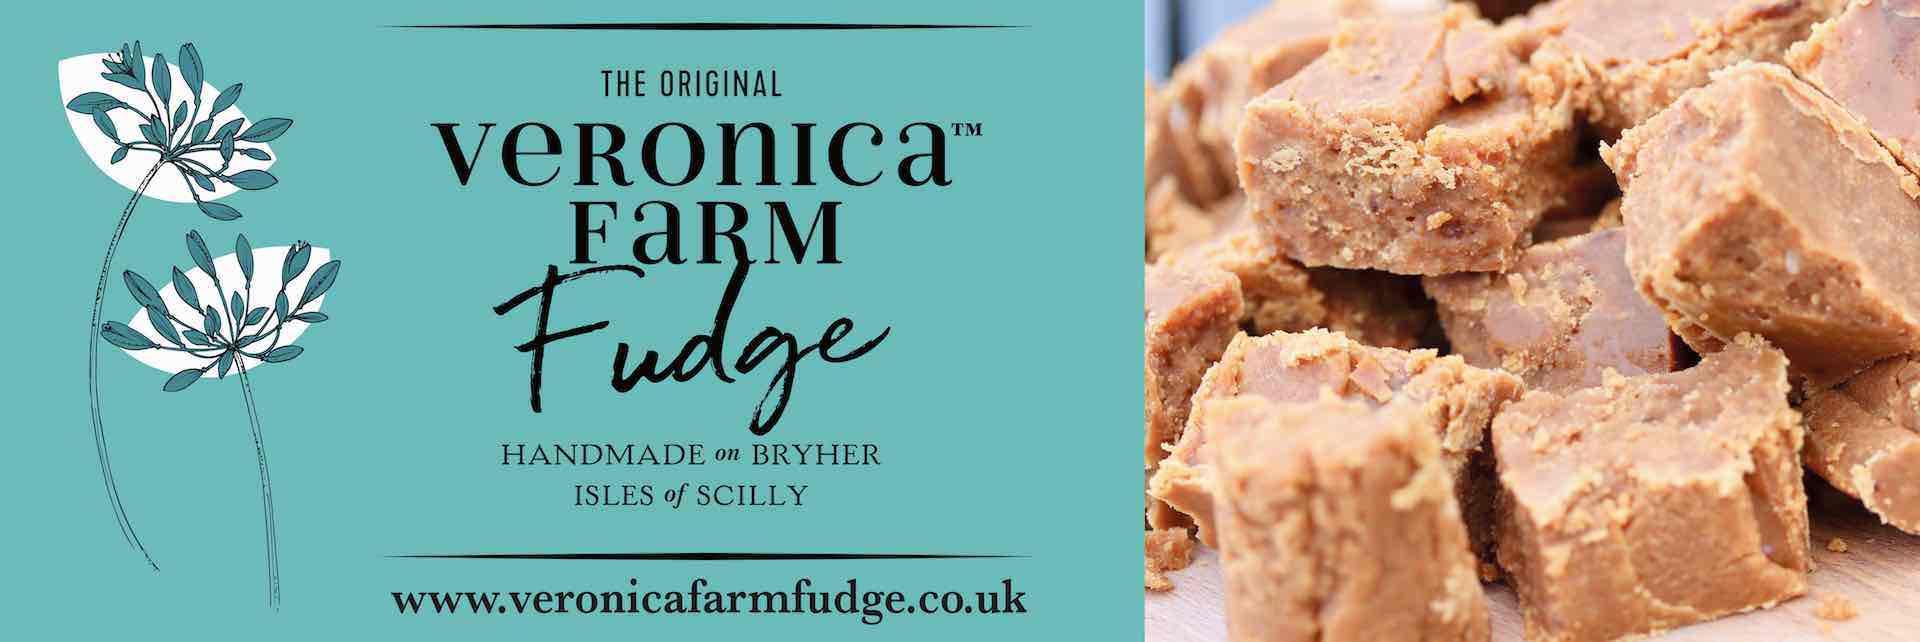 Veronica Farm Fudge Banner-01